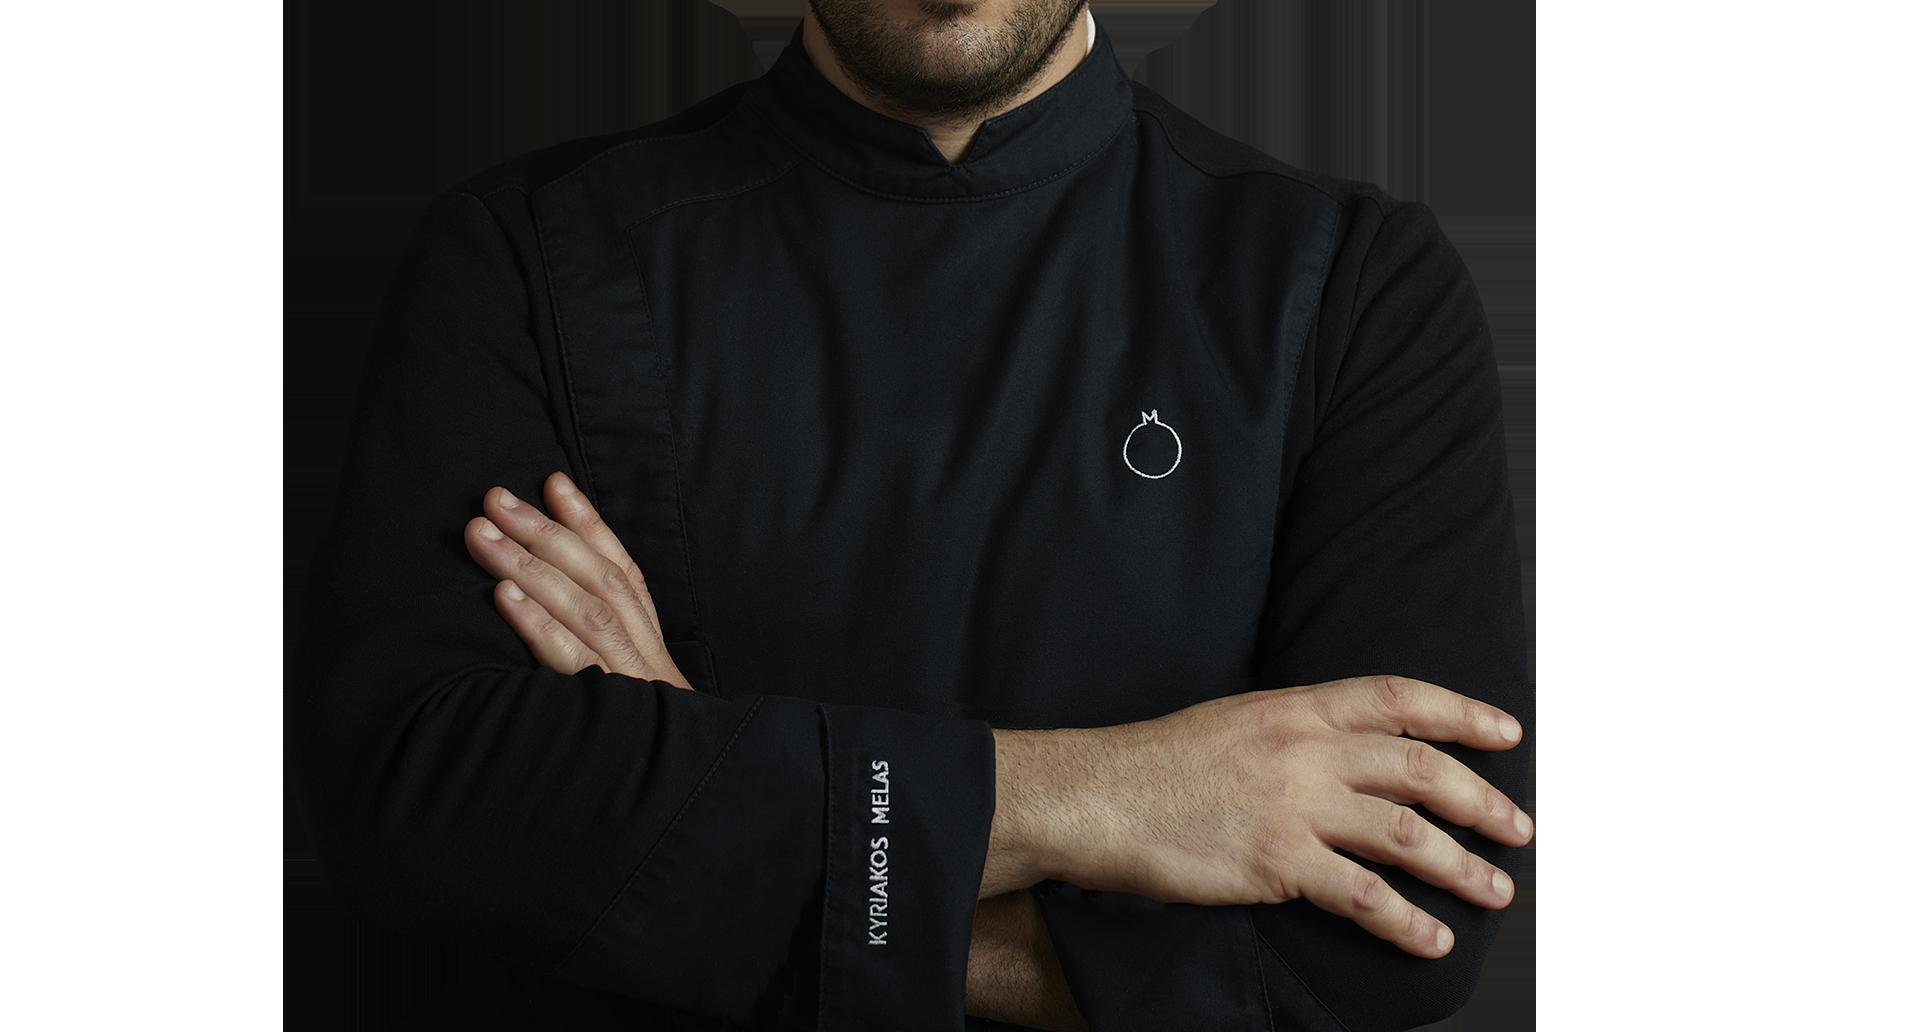 chef's visual identity